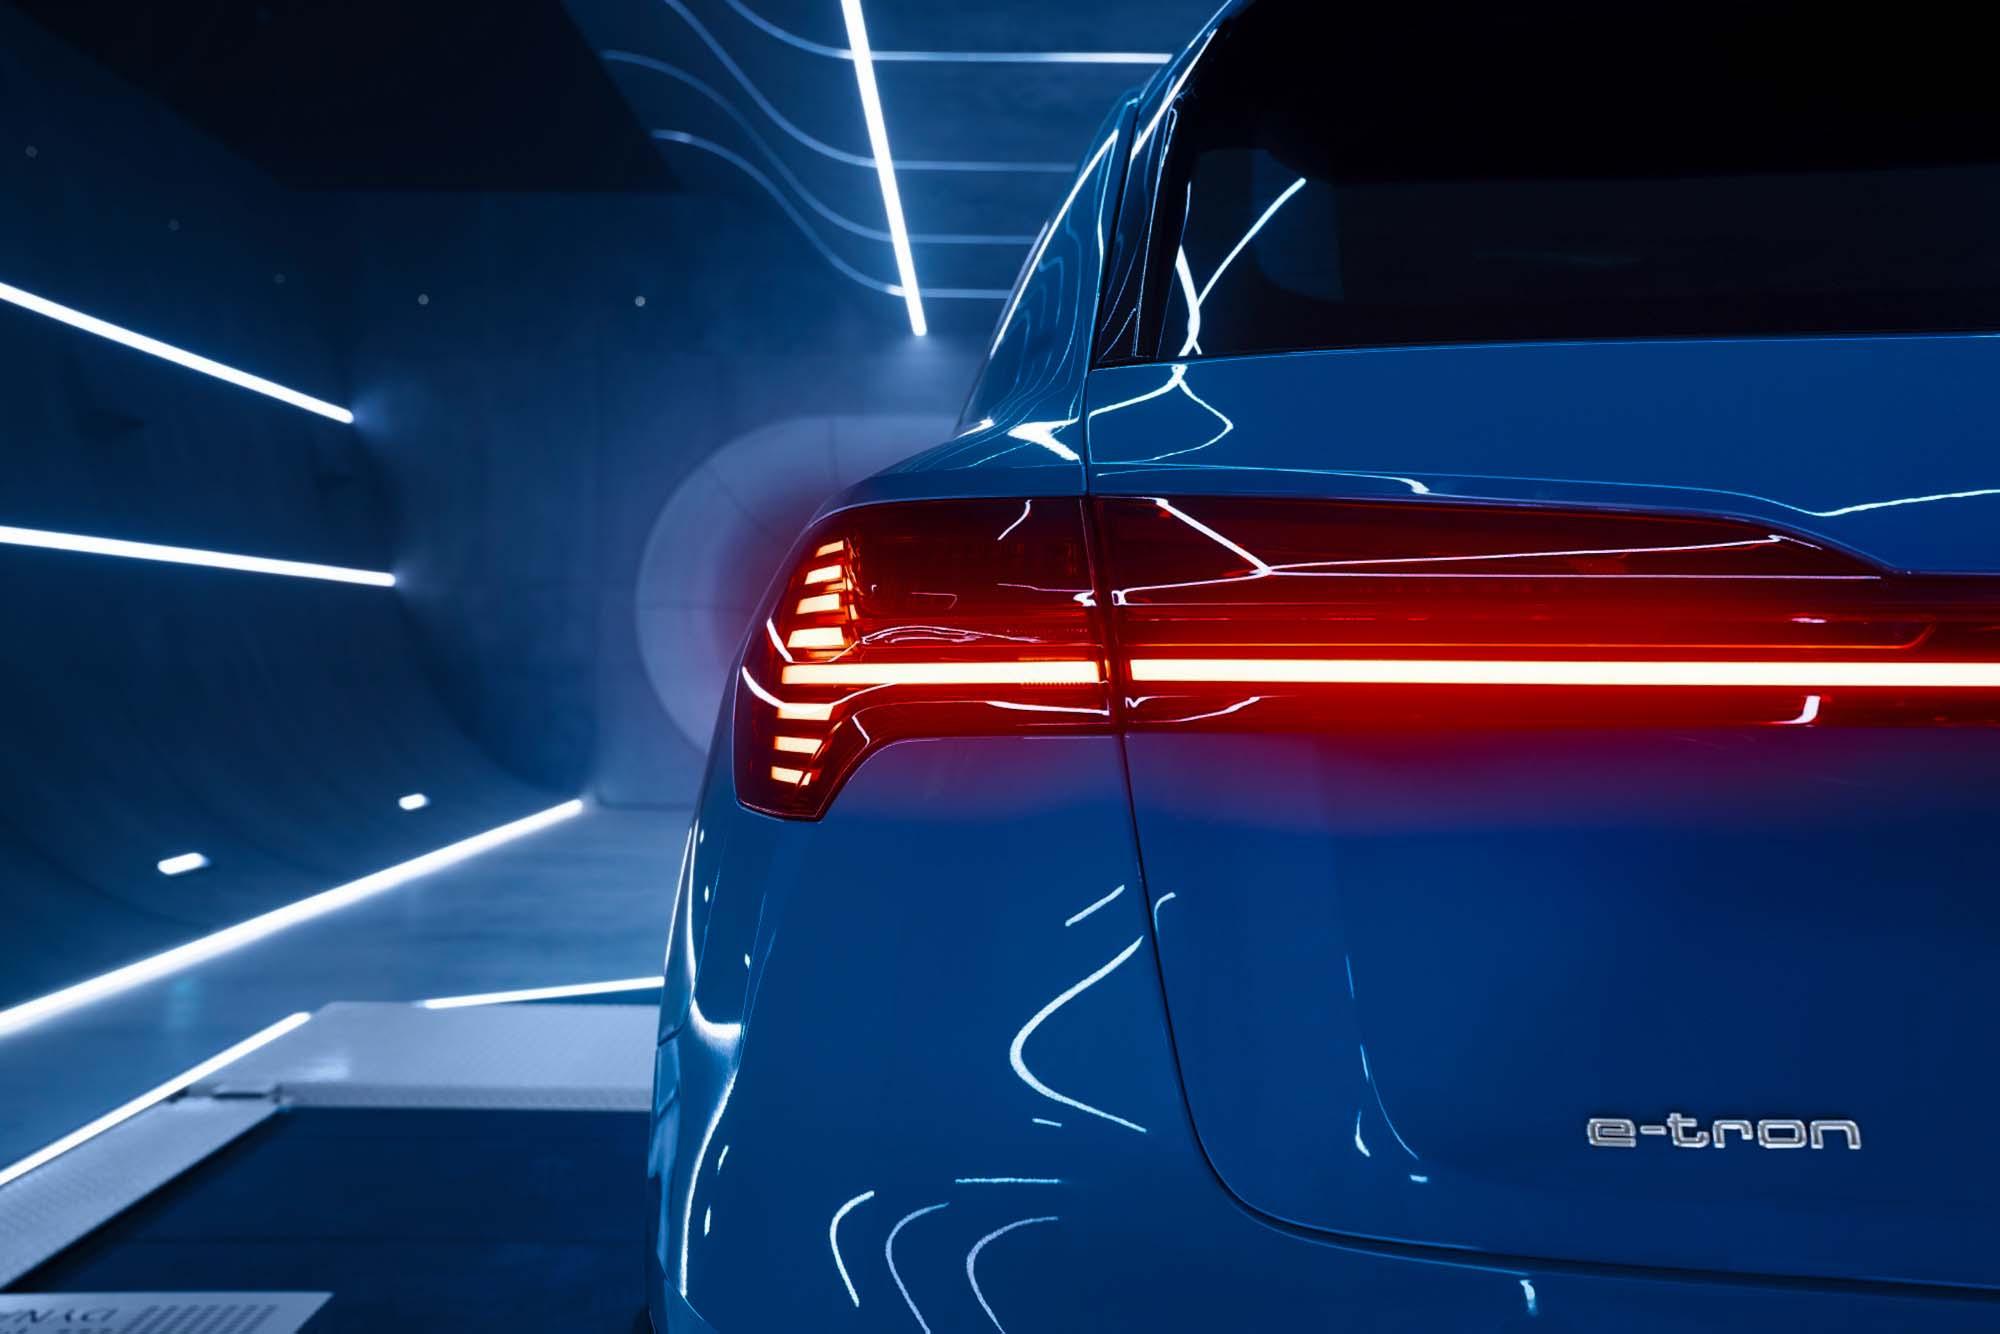 Audi Etron Quattro 1 by Jan van Endert